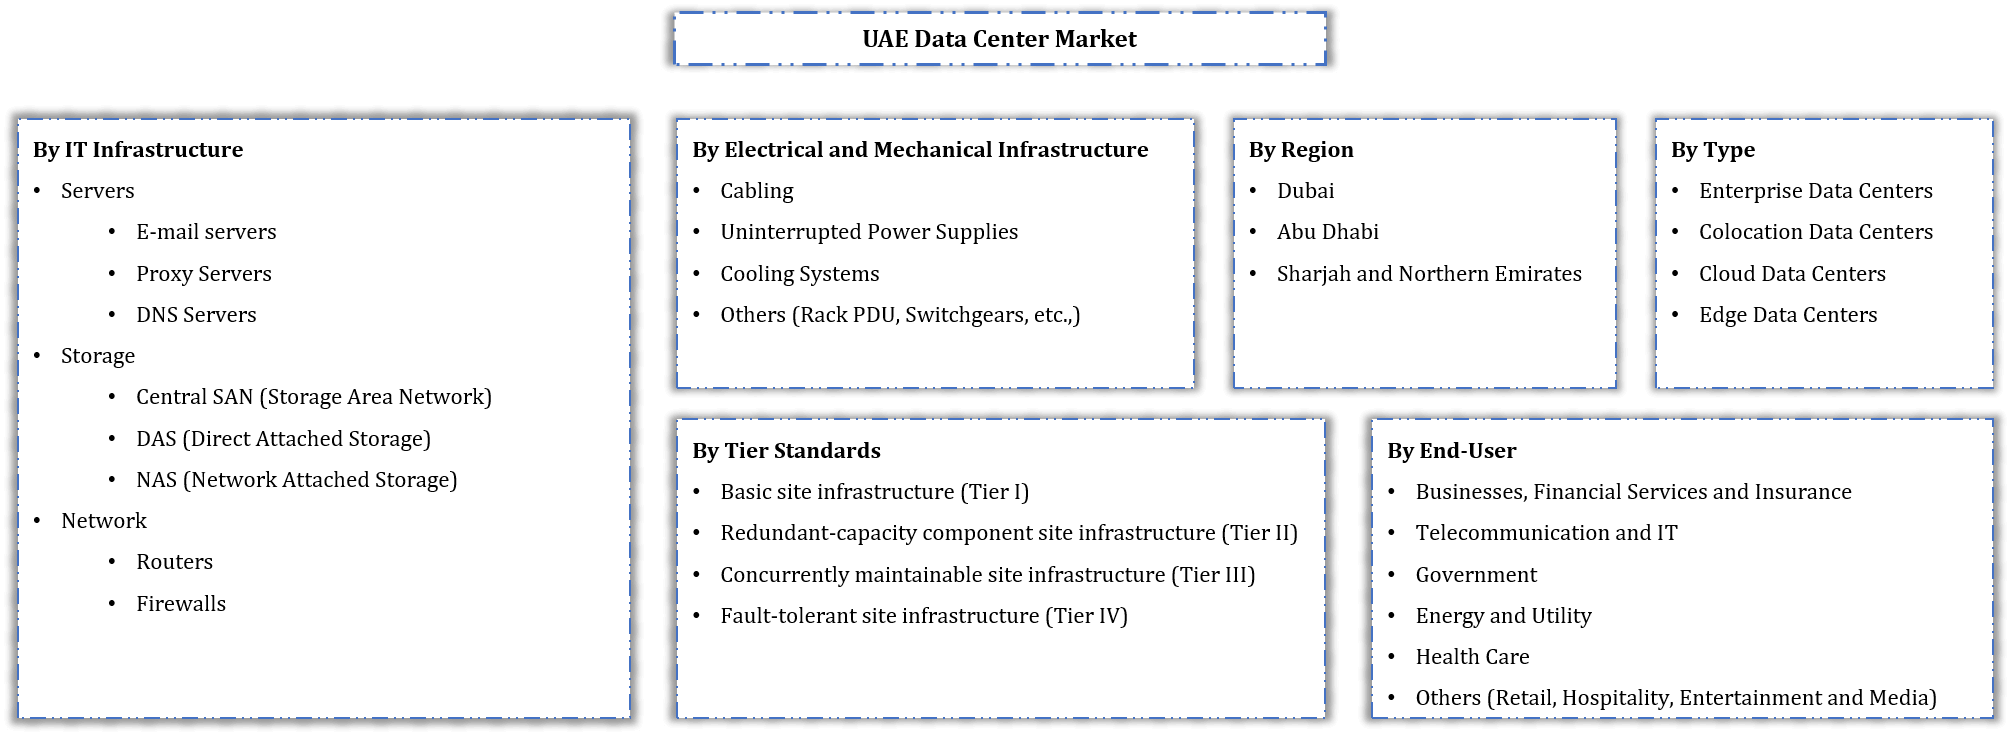 UAE Data Center Market Segmentation